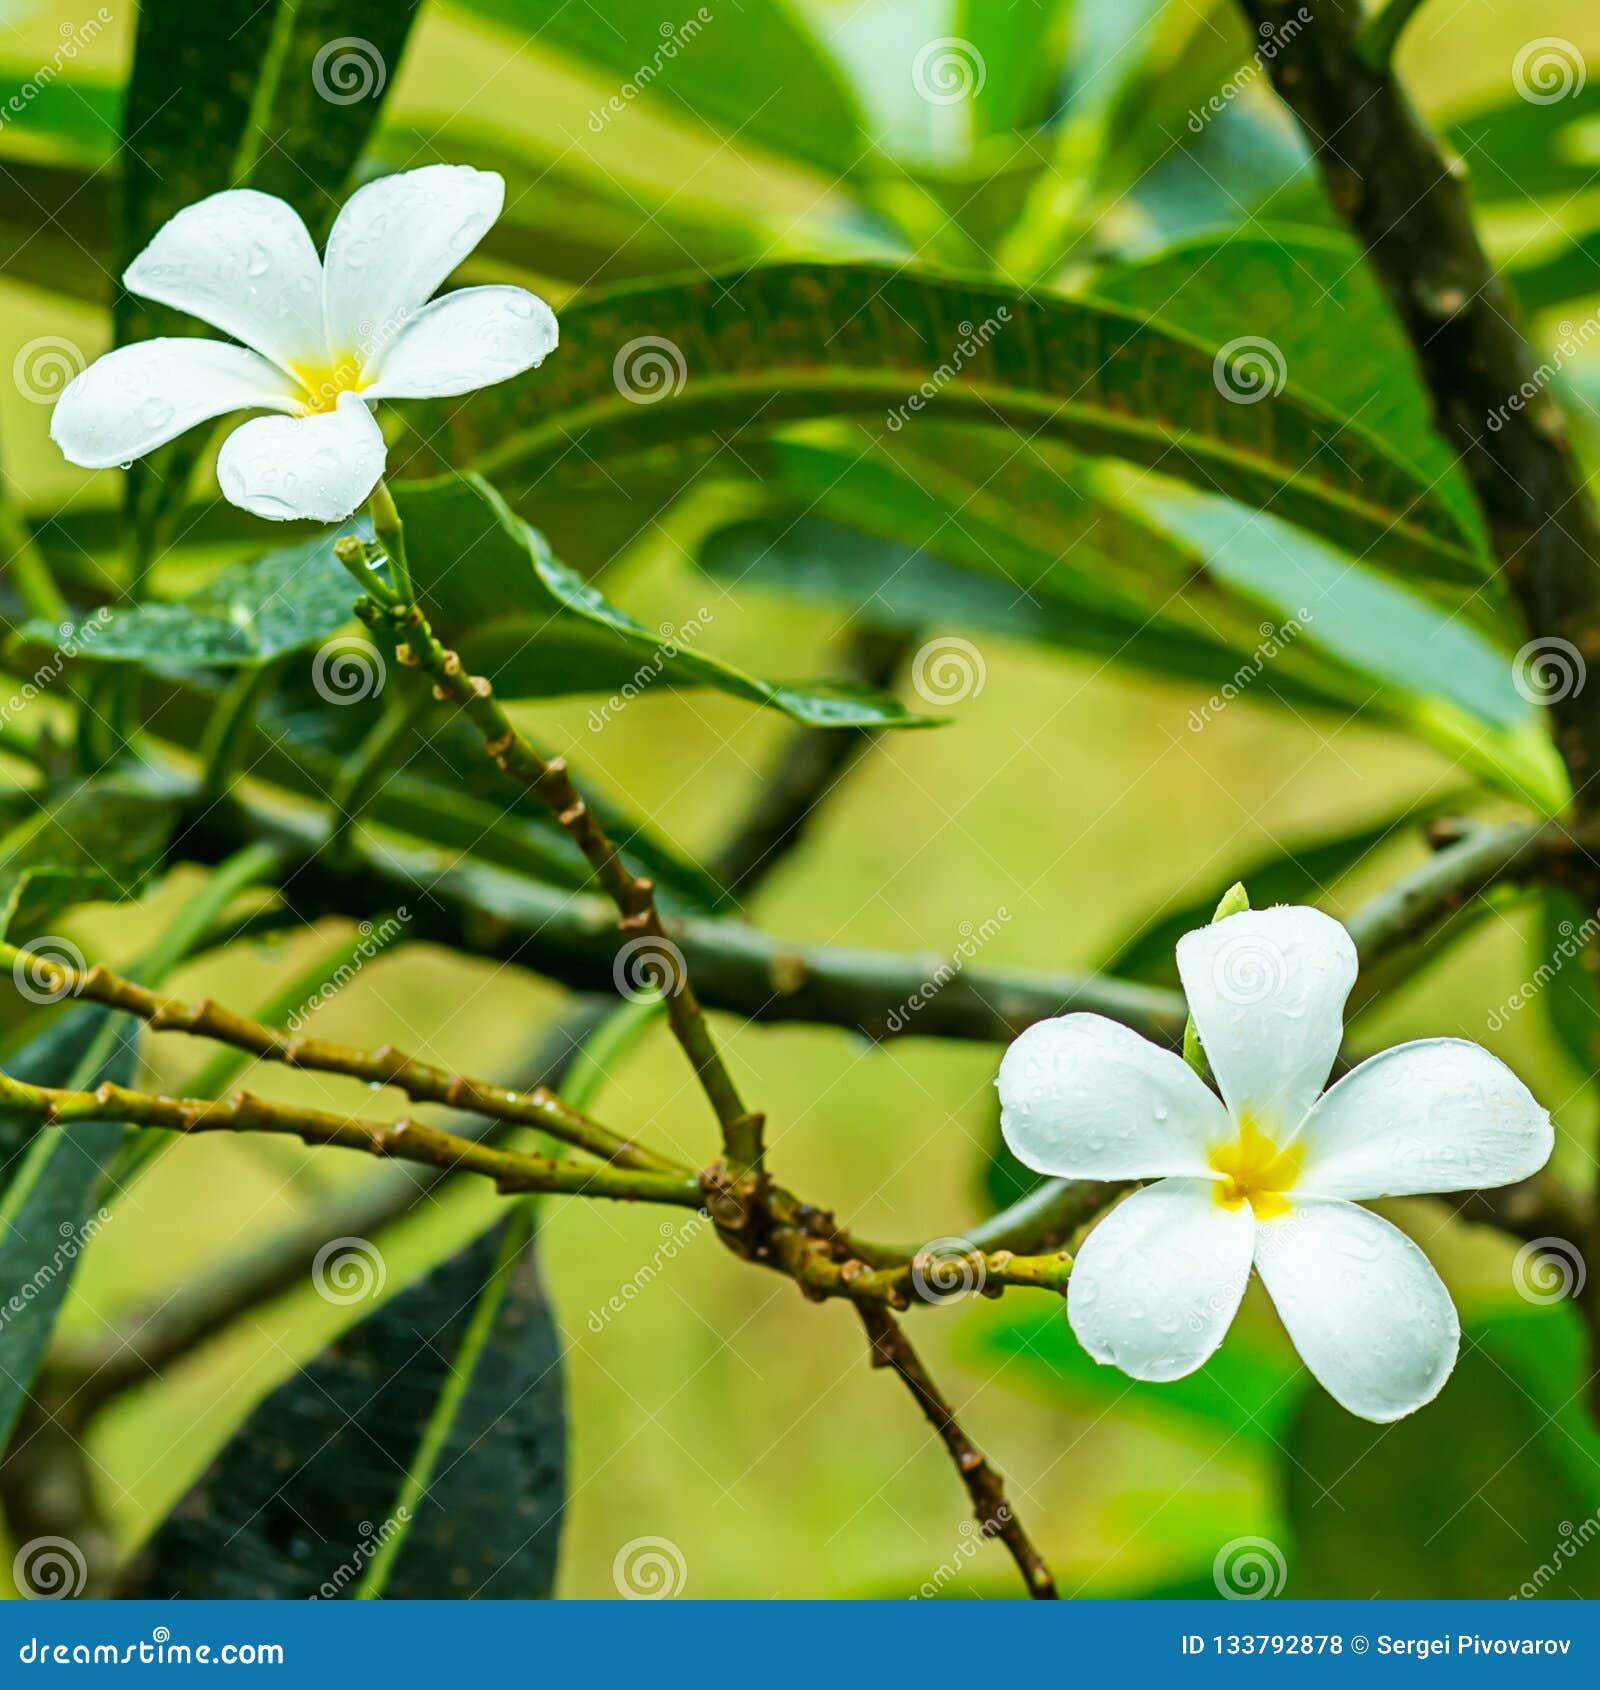 Base light magic background pair of white flowers Thailand plumeria symmetrical close-up tropical plant